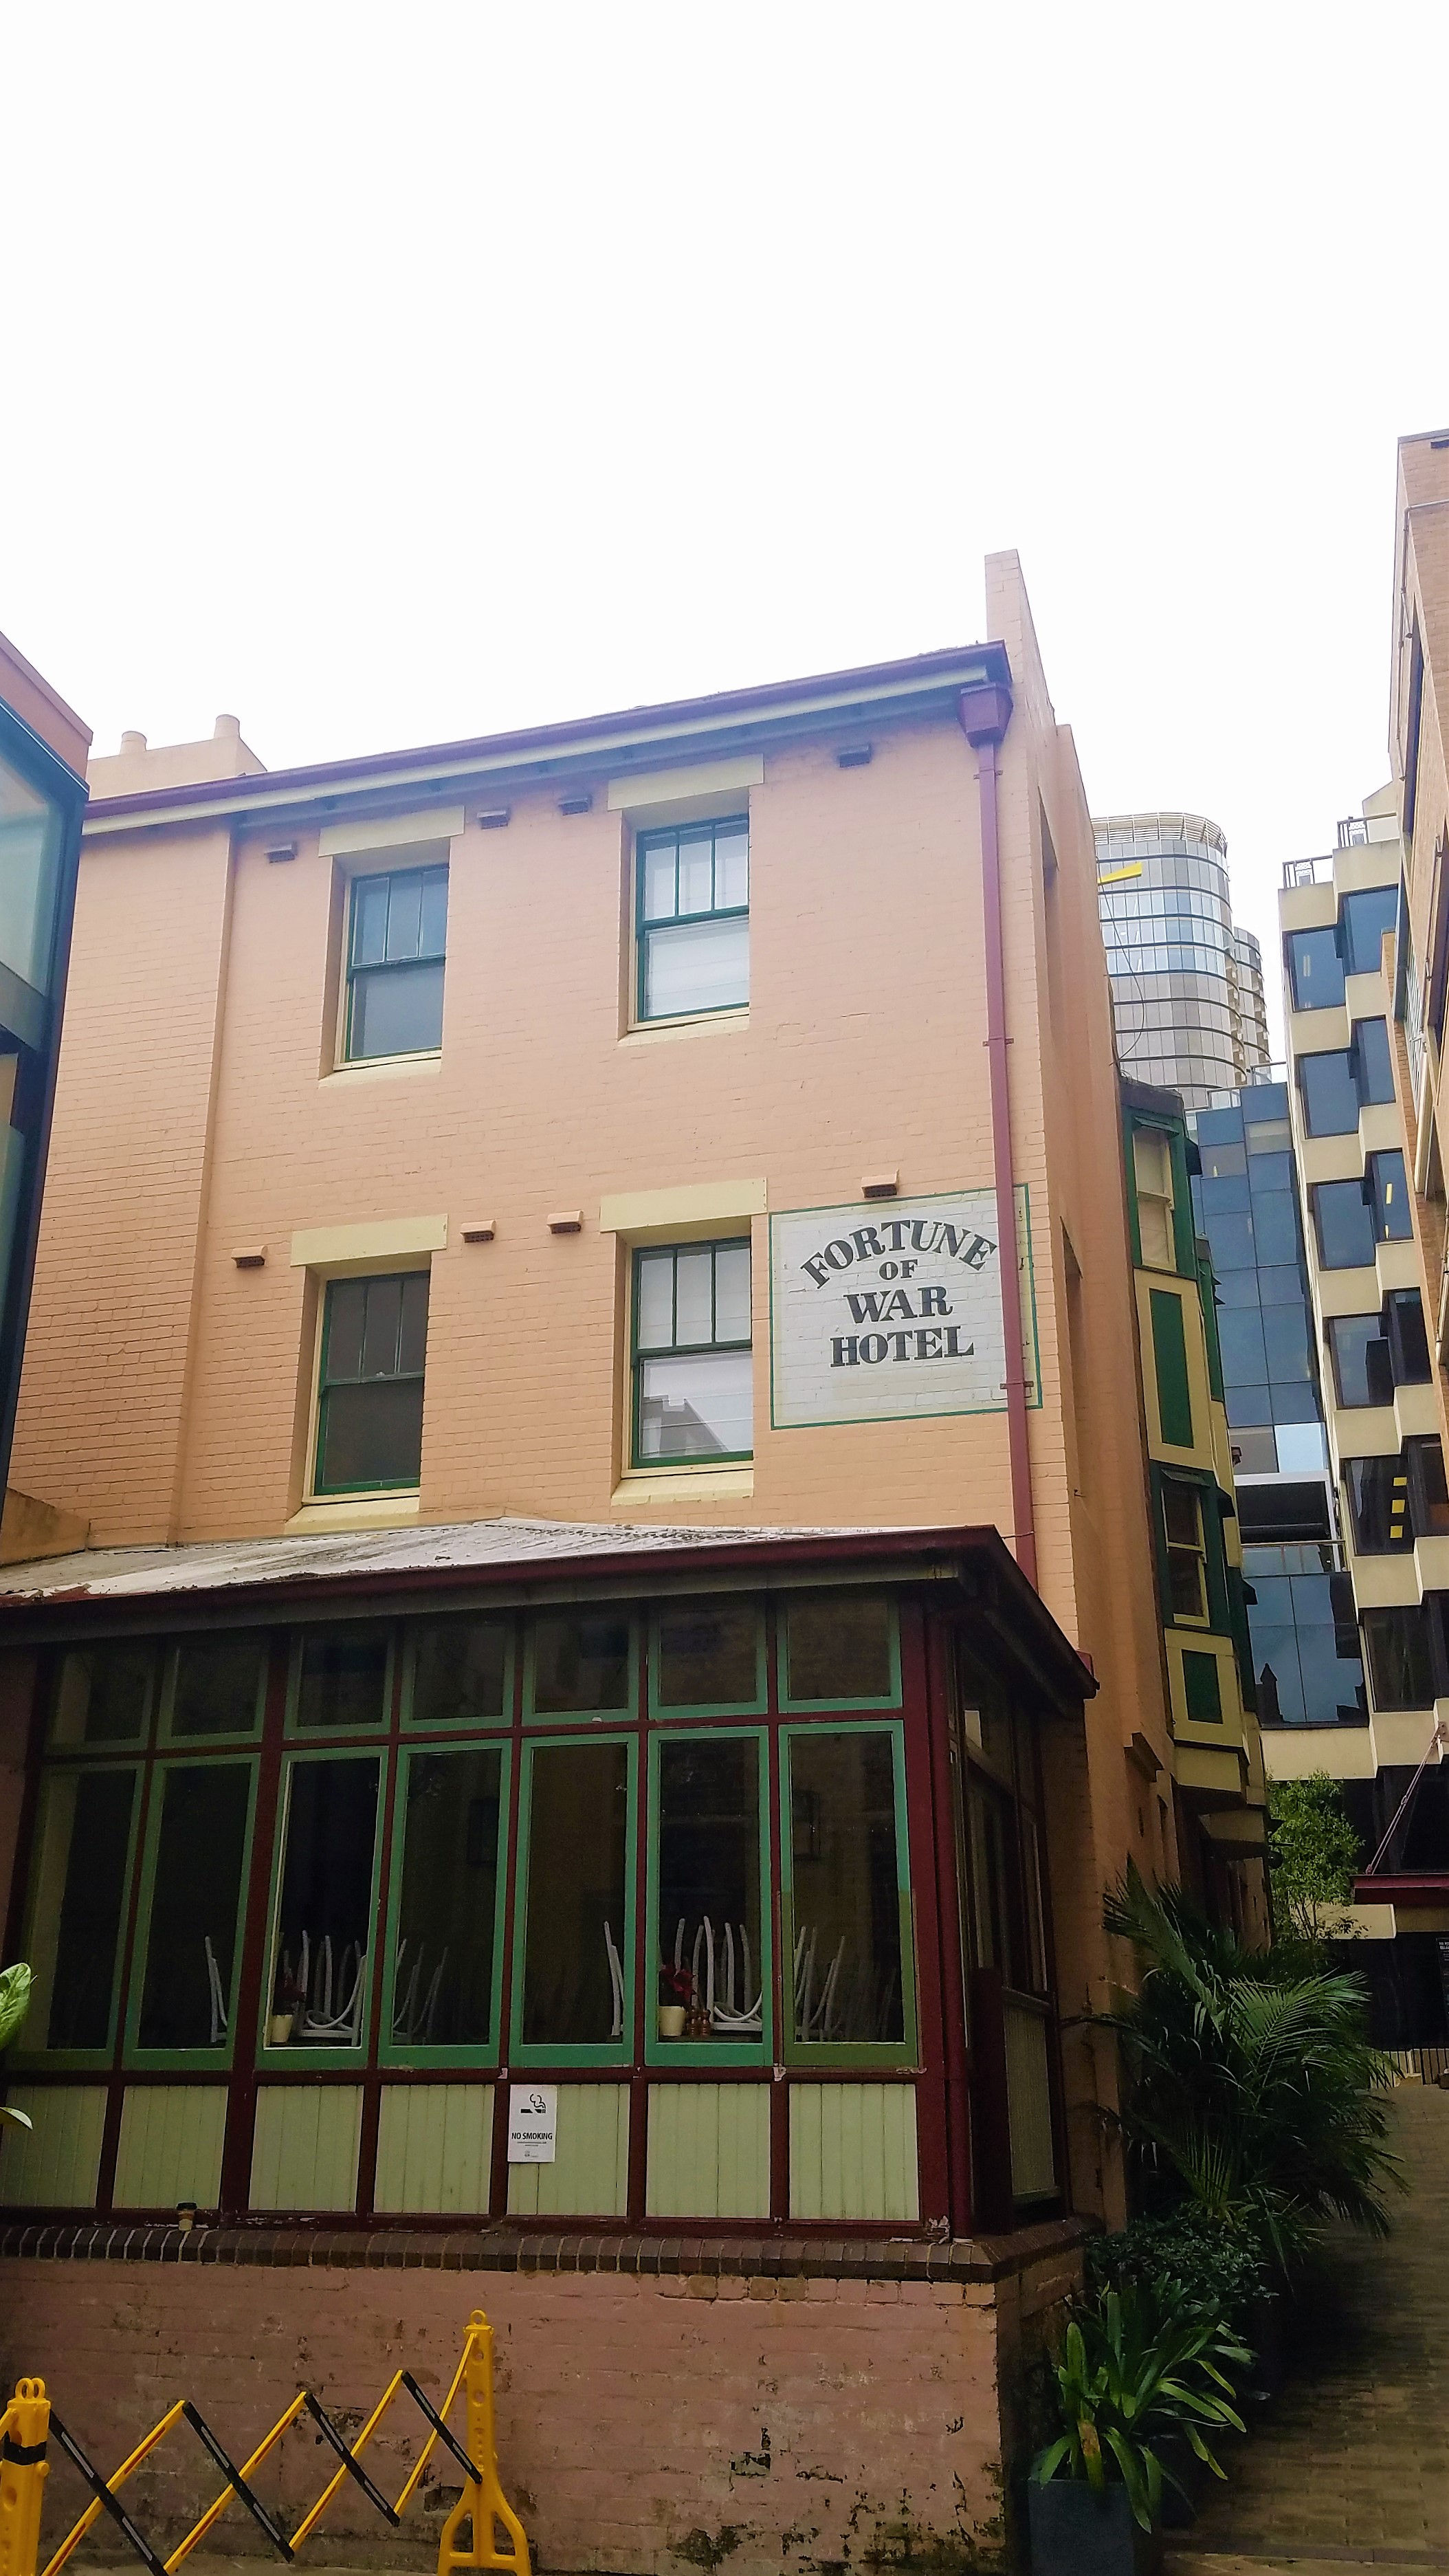 Australia Travel Guide | Sydney City Tour | The Rocks